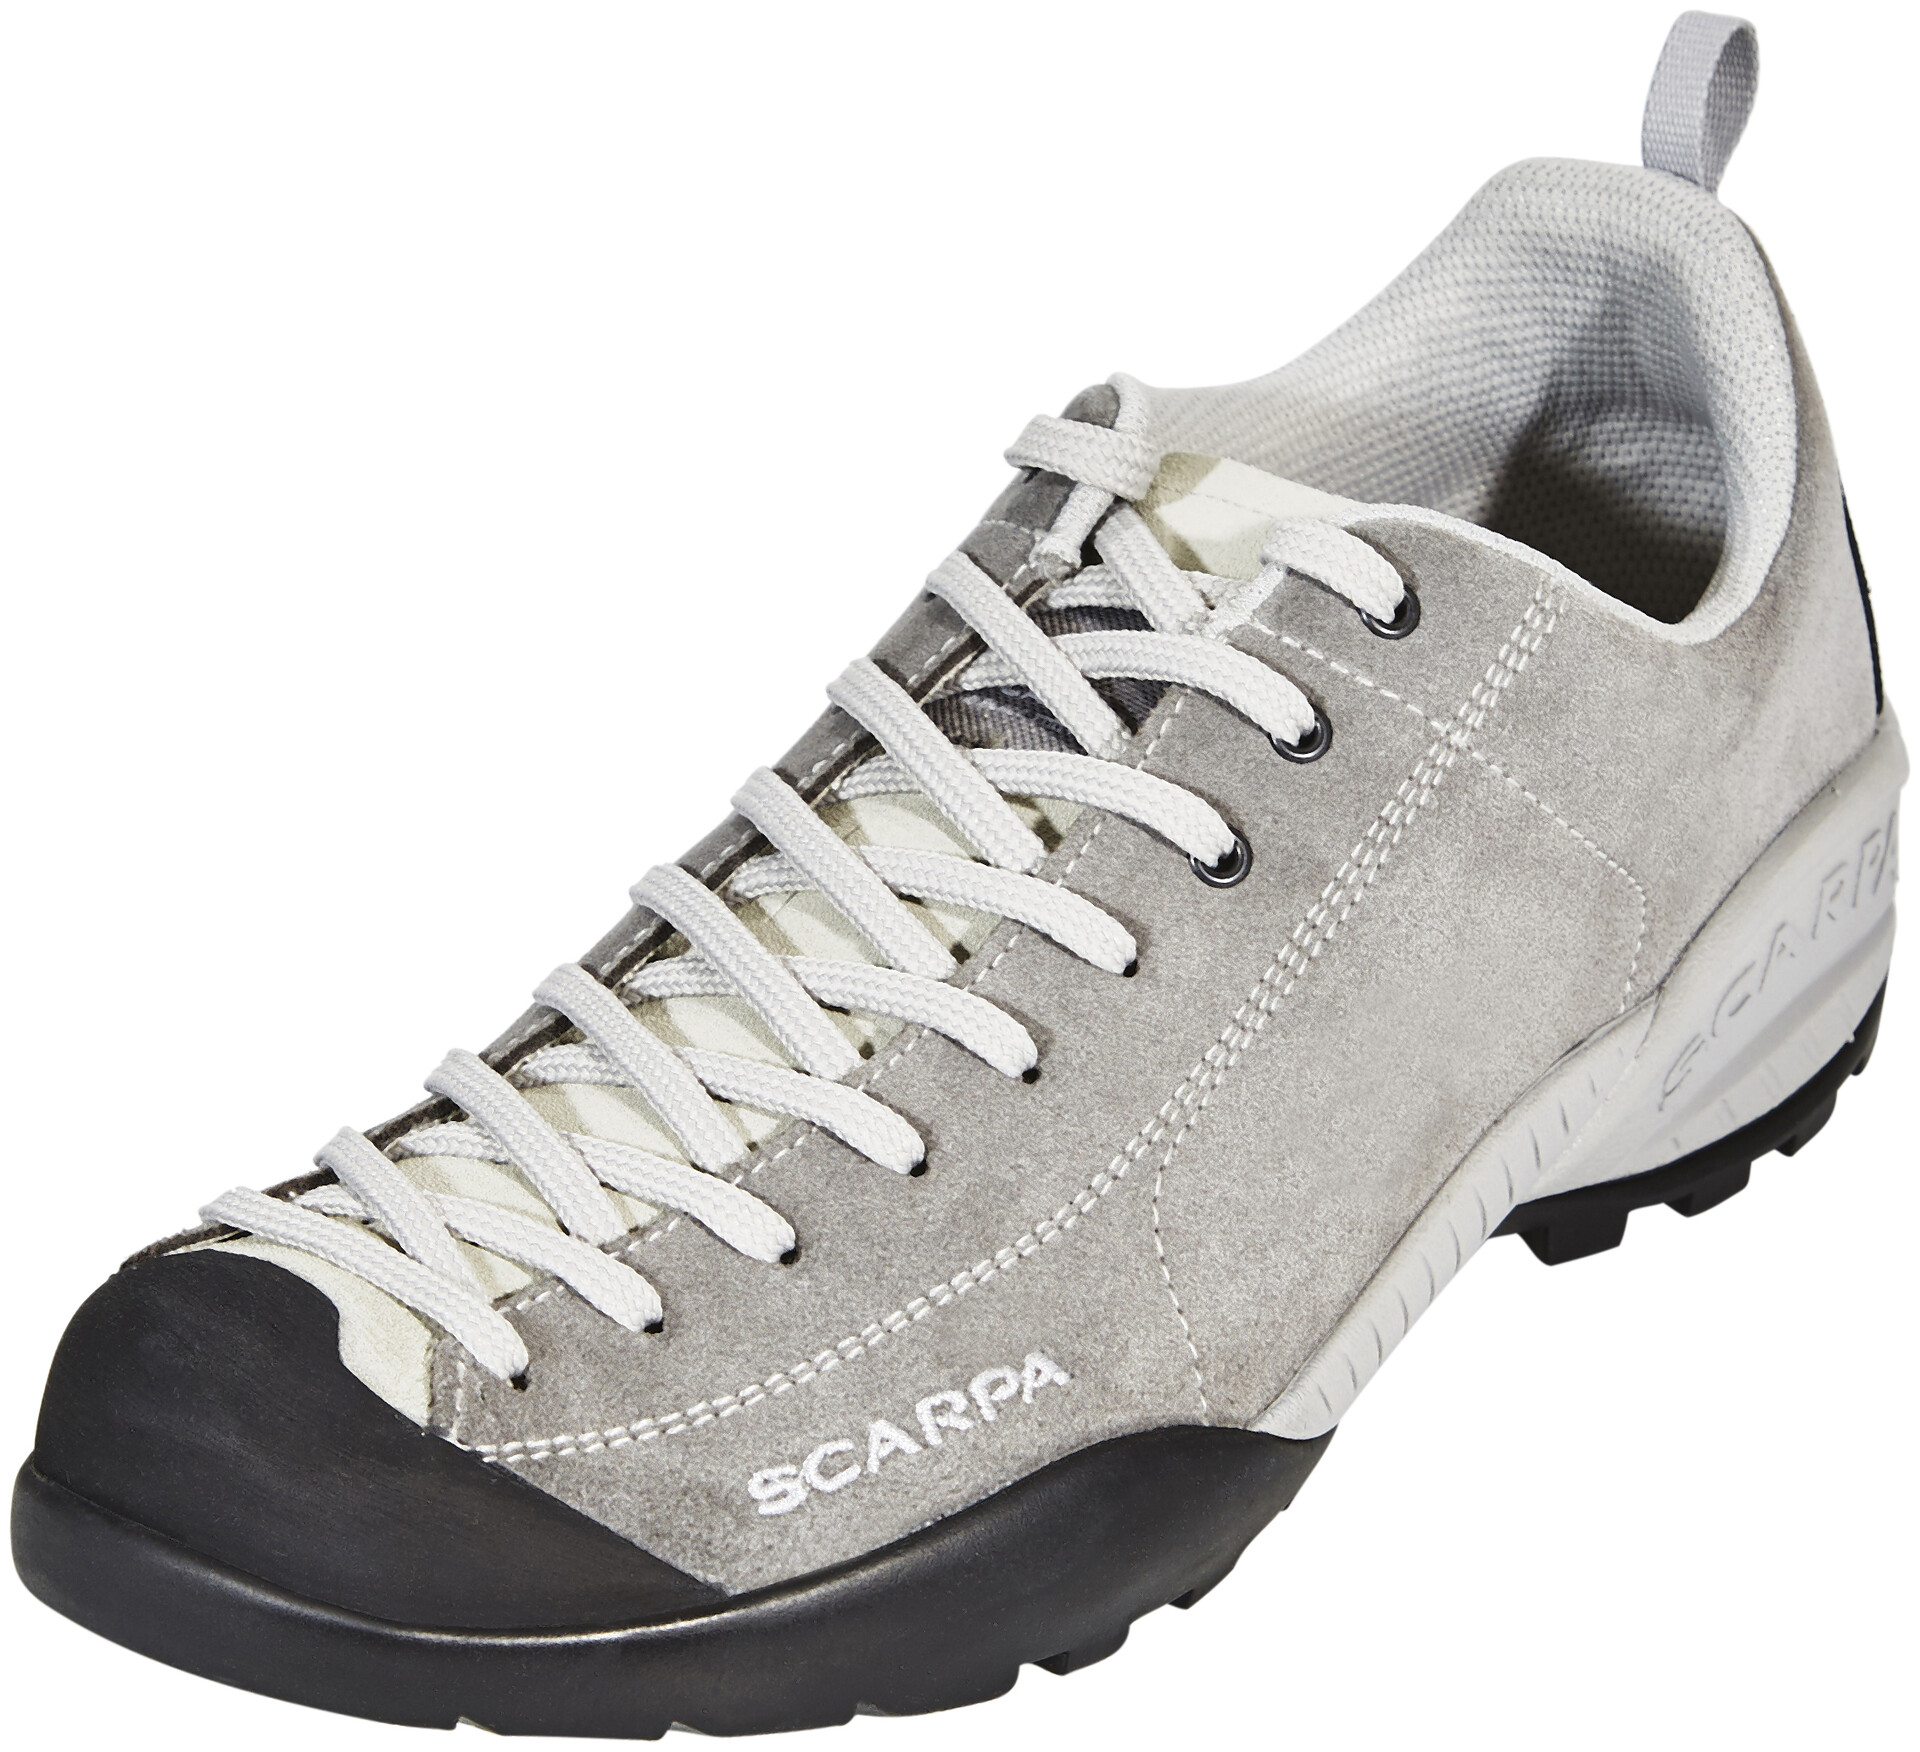 Shoes Midgray Scarpa Mojito Unisex Scarpa Midgray Mojito Scarpa Shoes Mojito Shoes Unisex Unisex N80wvnm